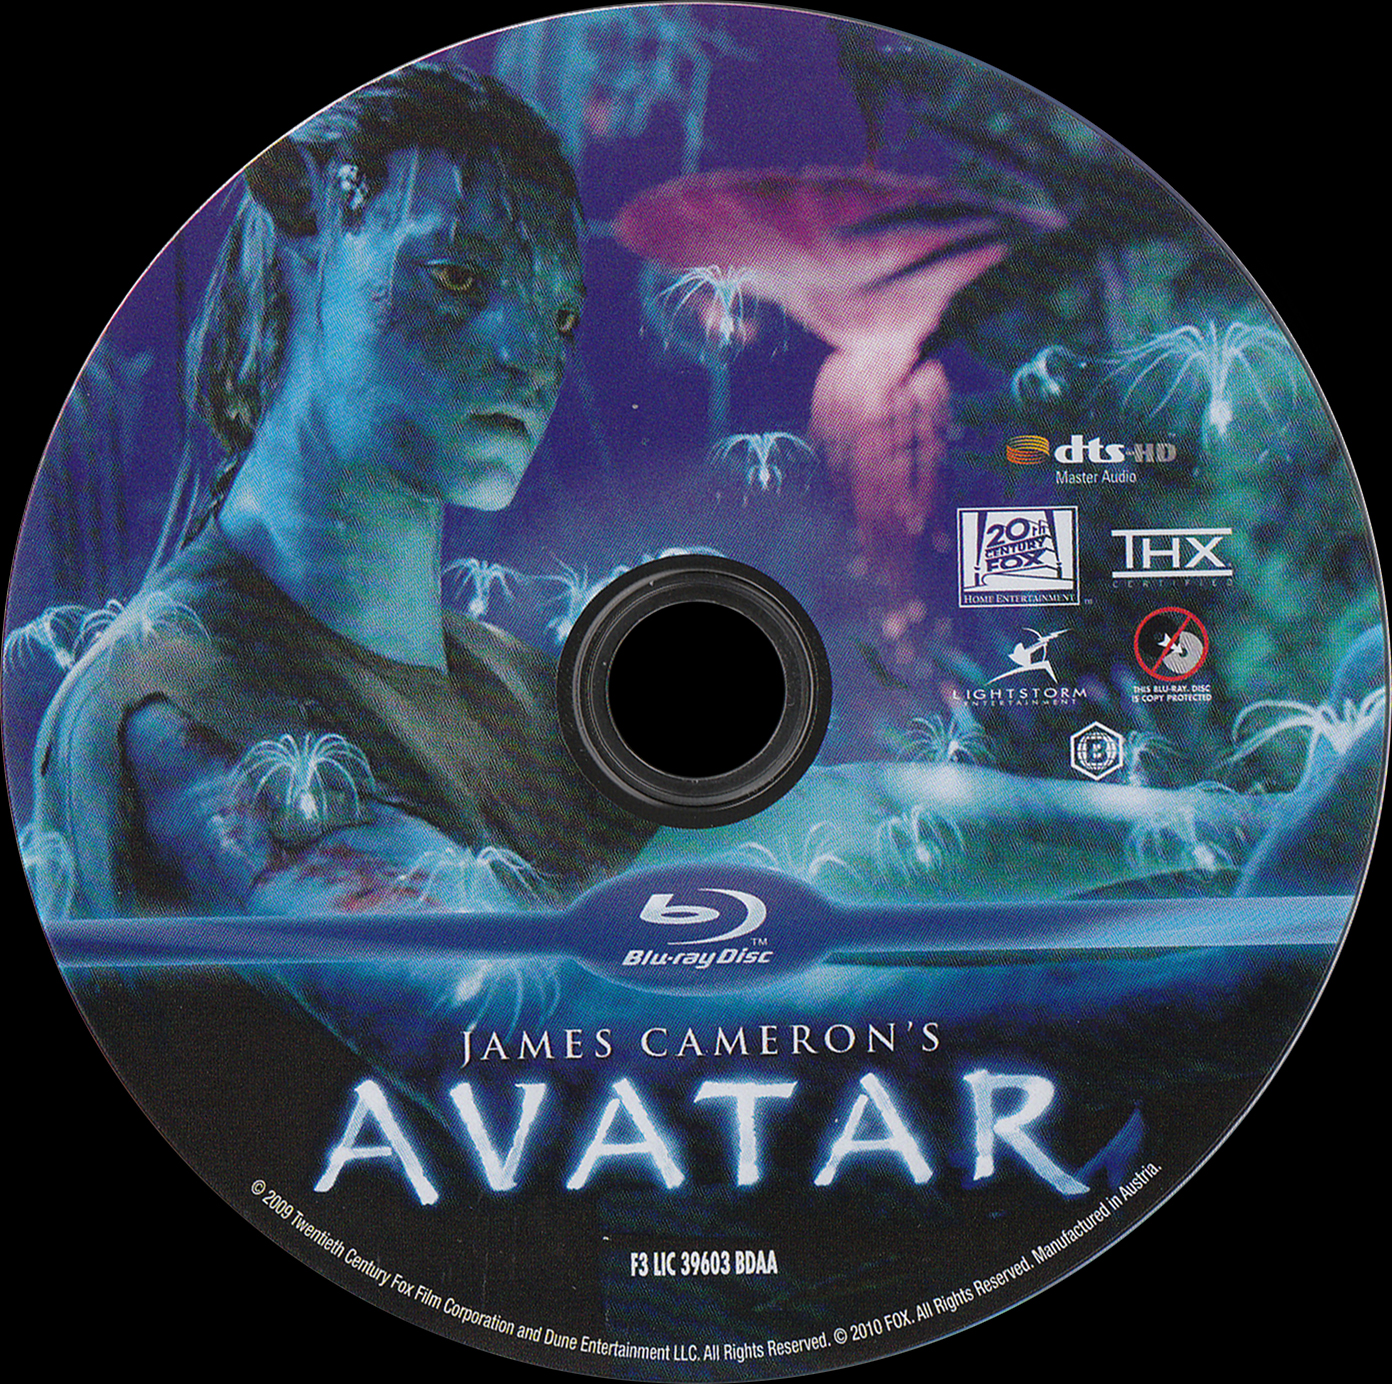 Avatar 2 Location: Image - Avatar-1-bd-czesvk-cd.jpg